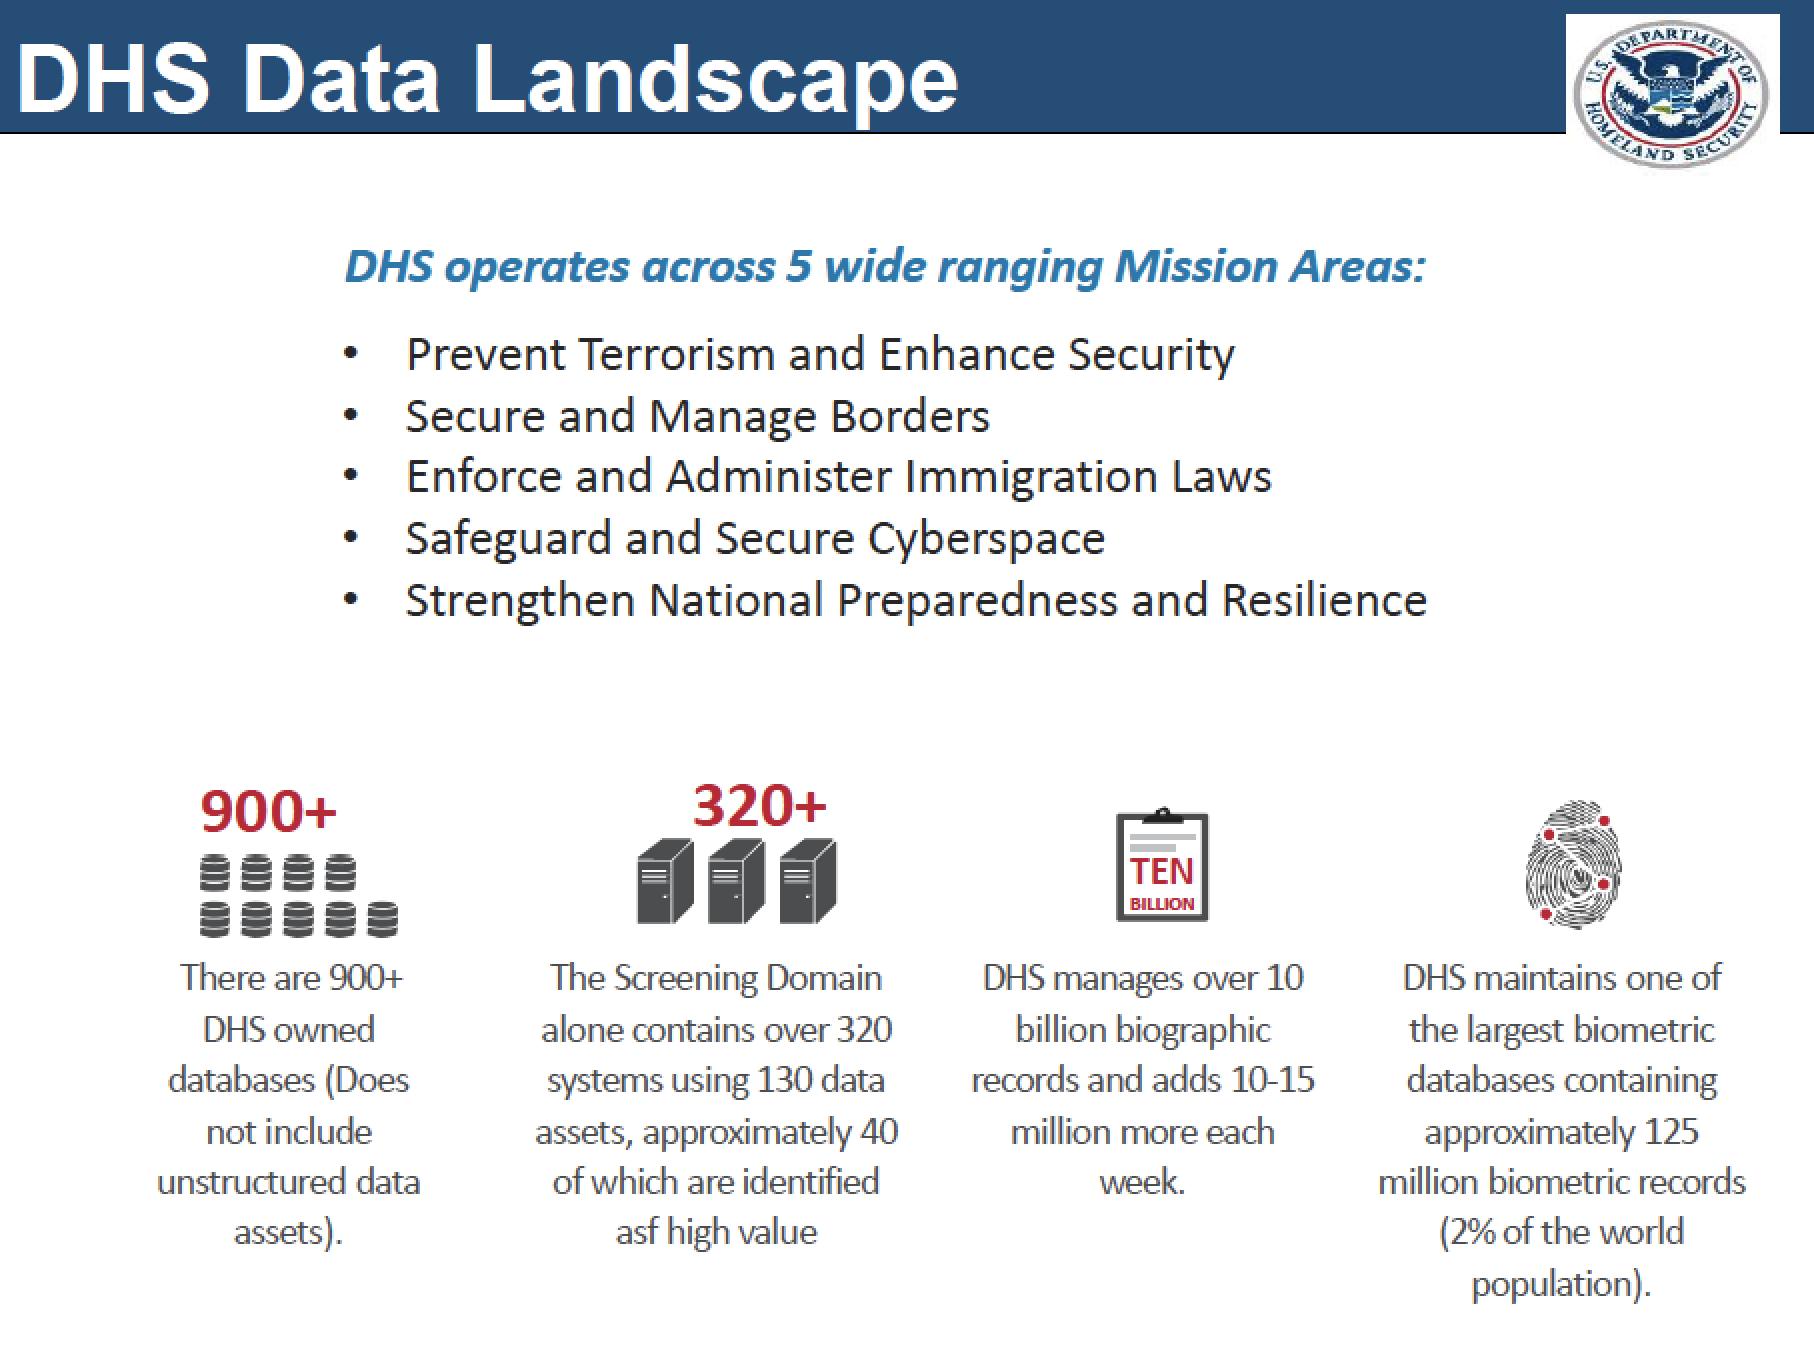 DHS Data Landscape